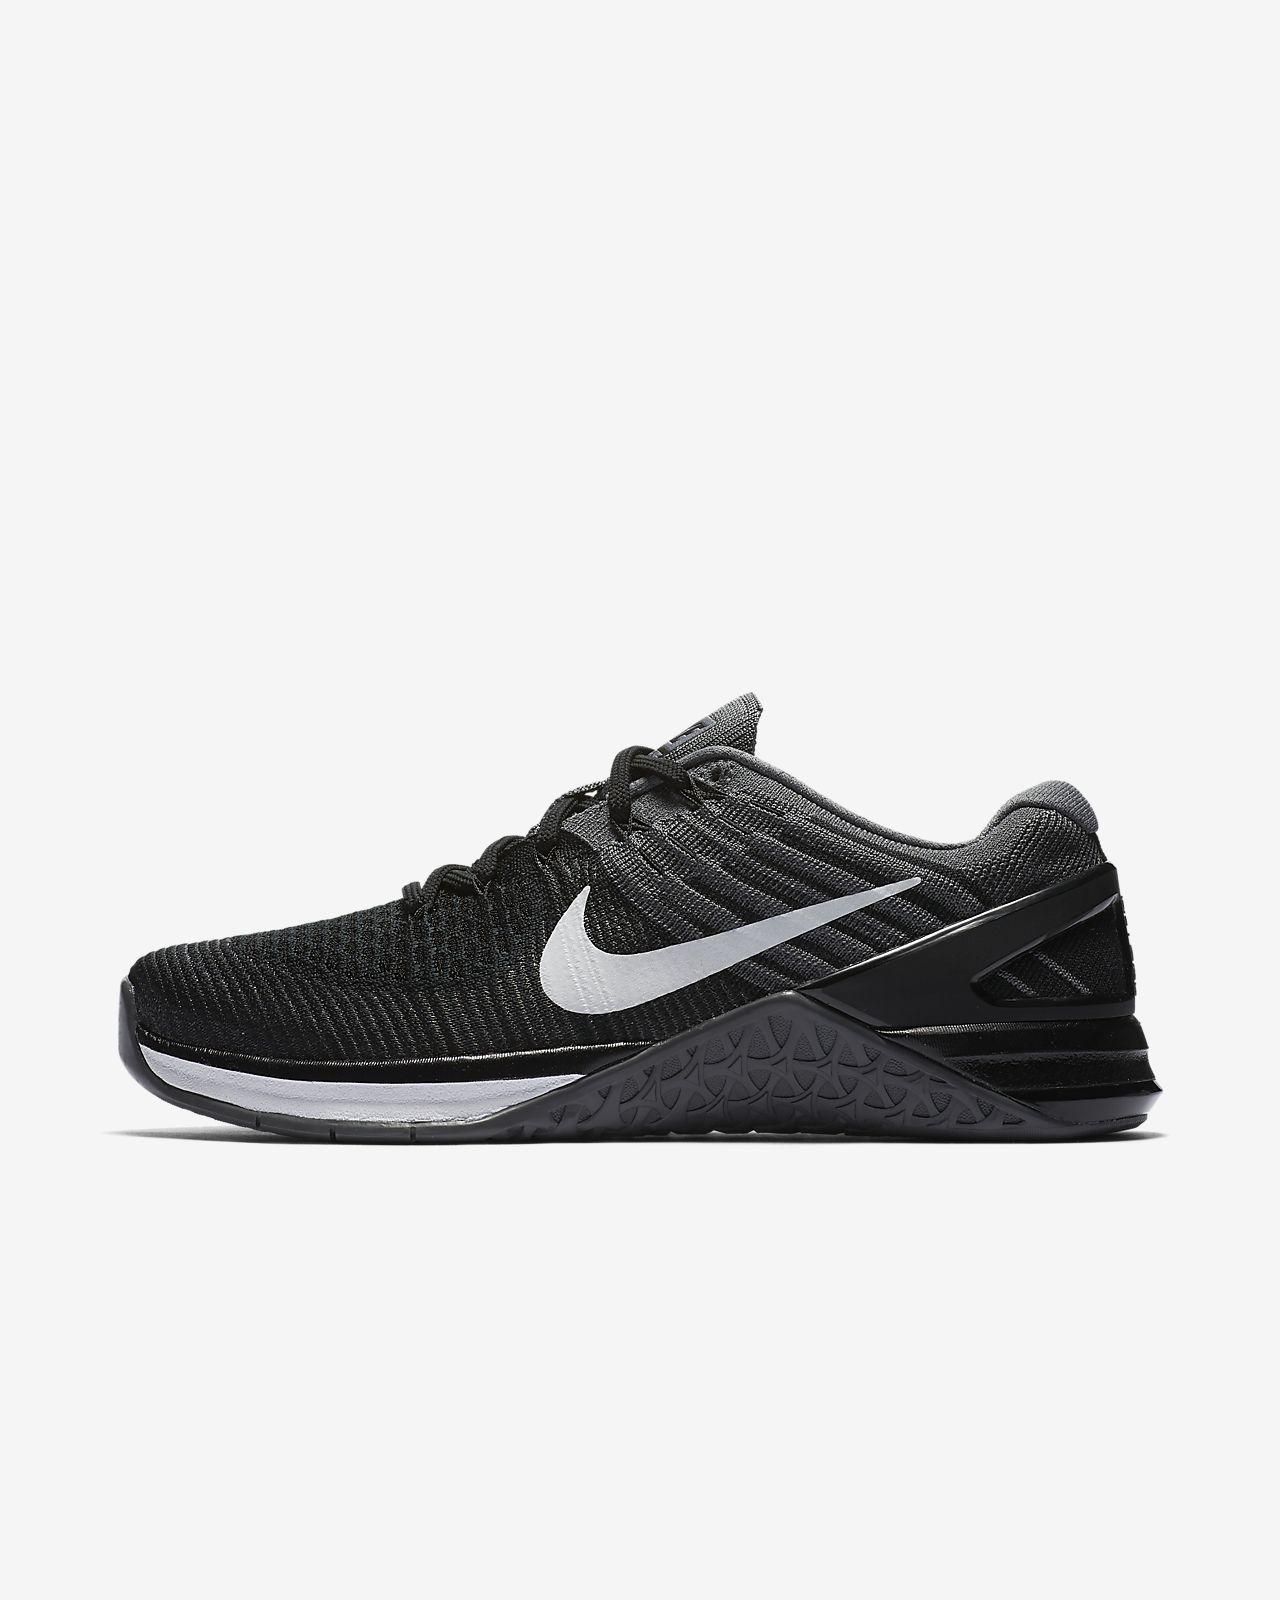 Nike flyknits Taglia 6 Nero e Bianco